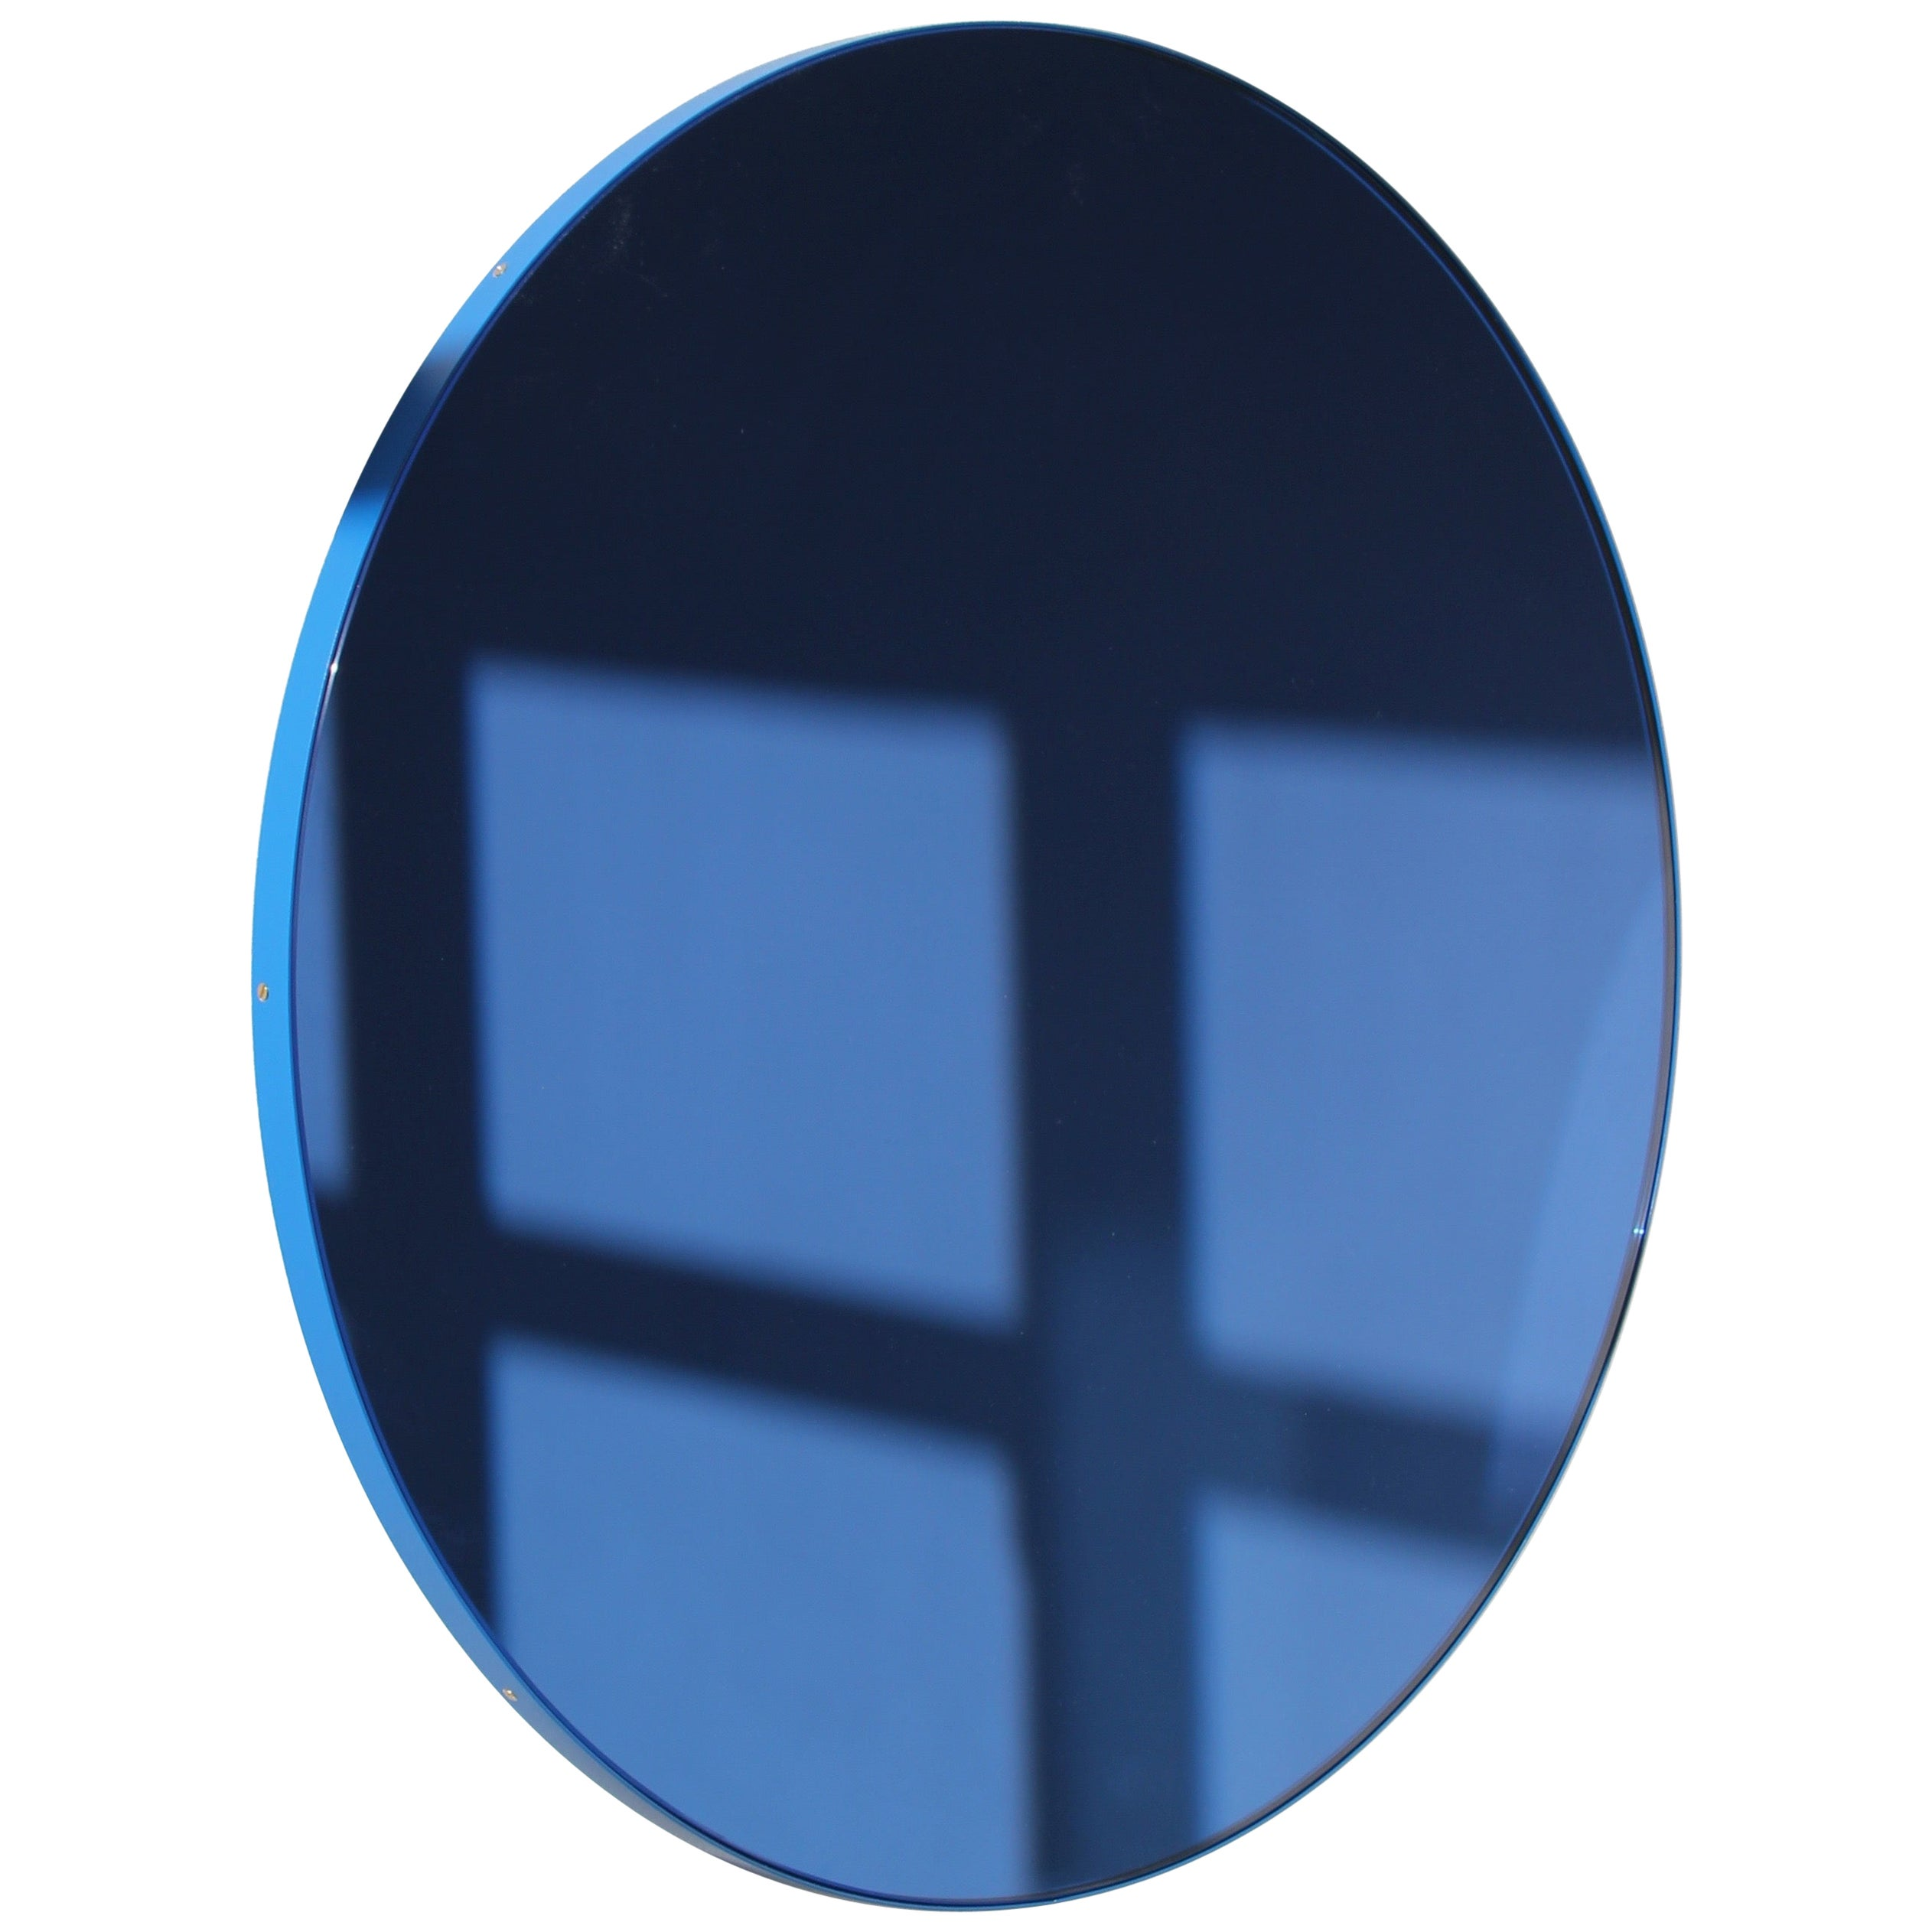 Orbis™ Blue Tinted Bespoke Round Mirror with a Blue Frame - Medium